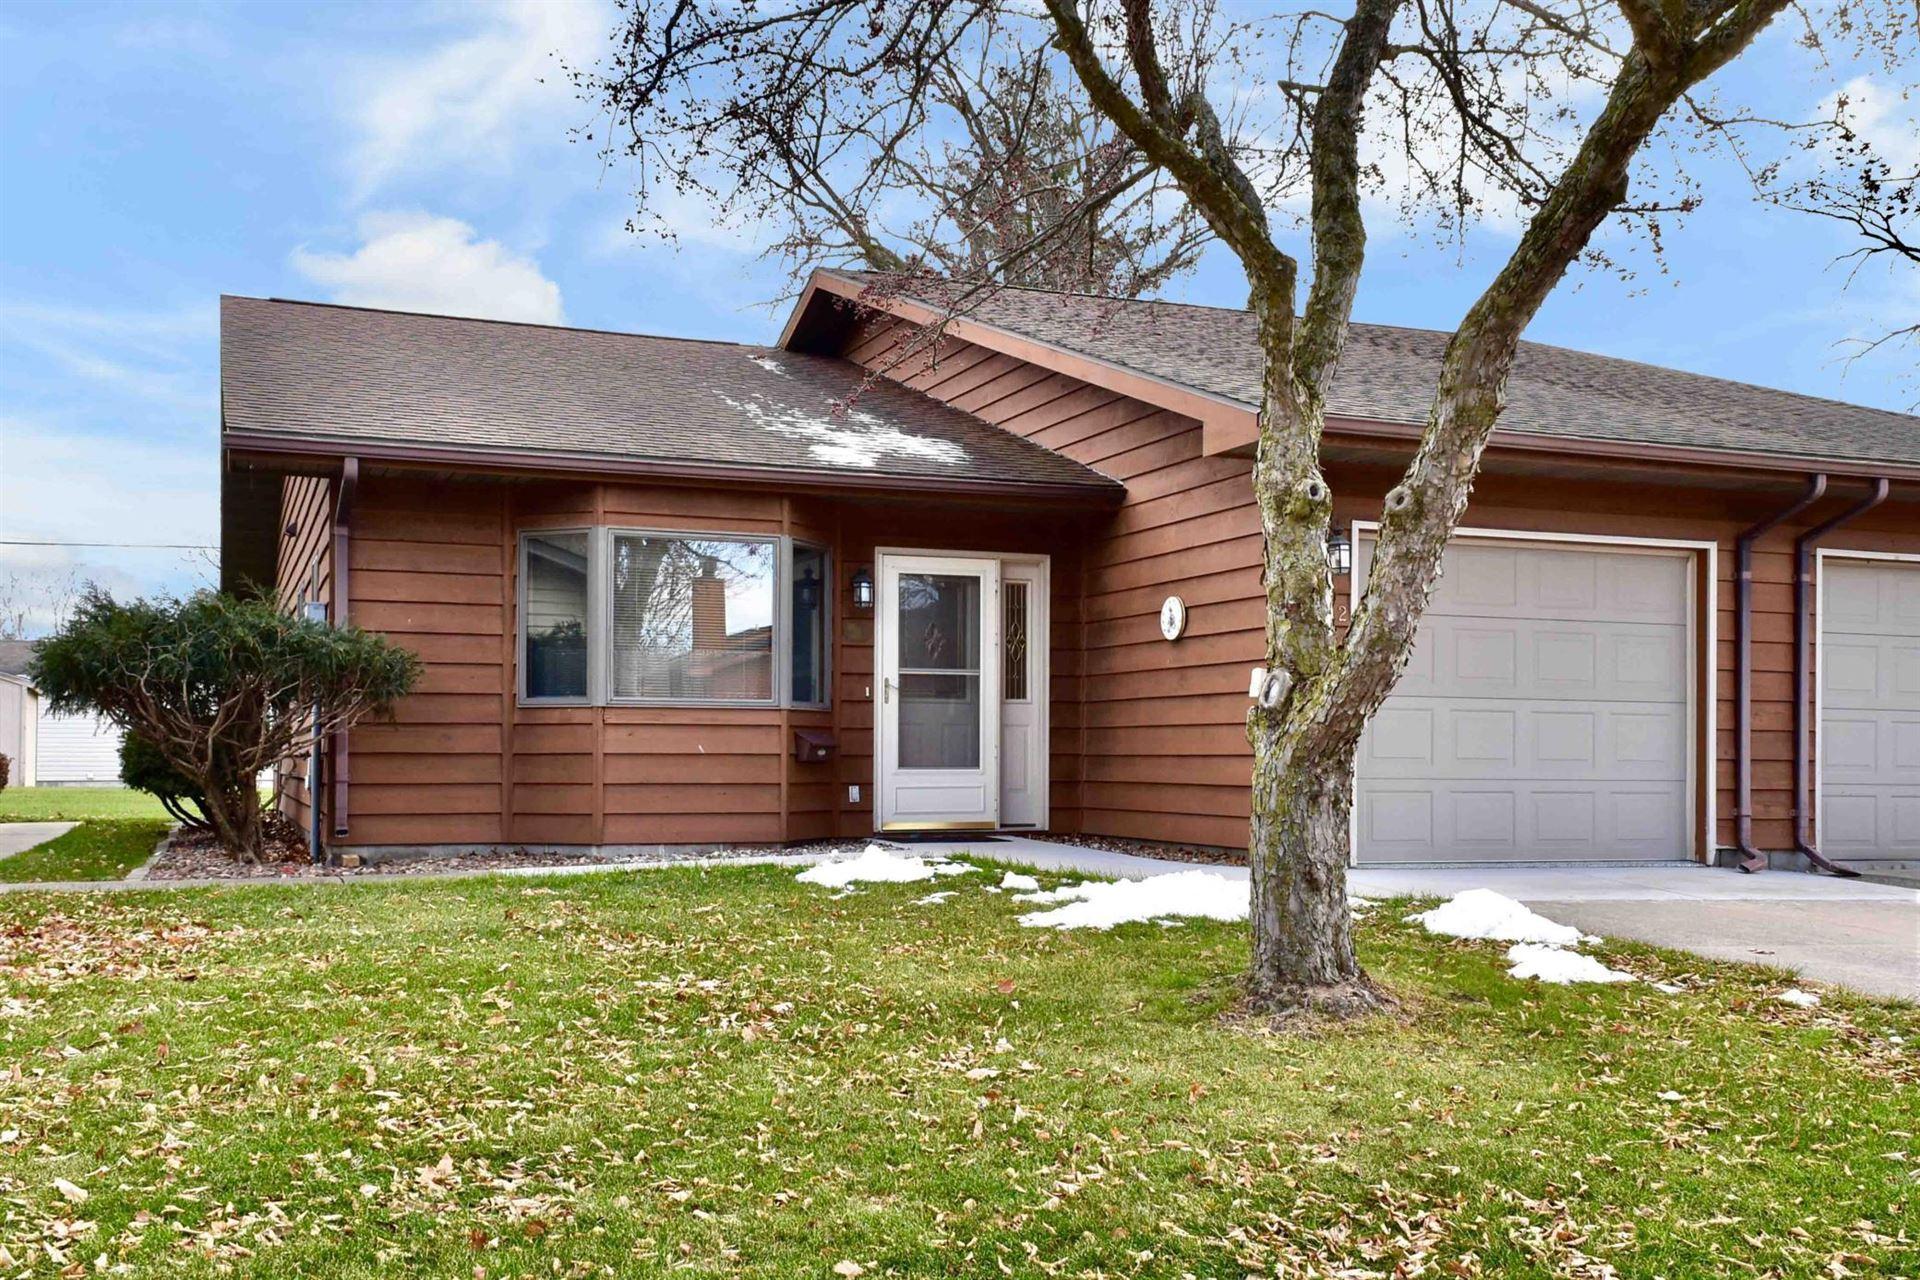 1372 Brookview Drive, Winona, MN 55987 - MLS#: 5689802